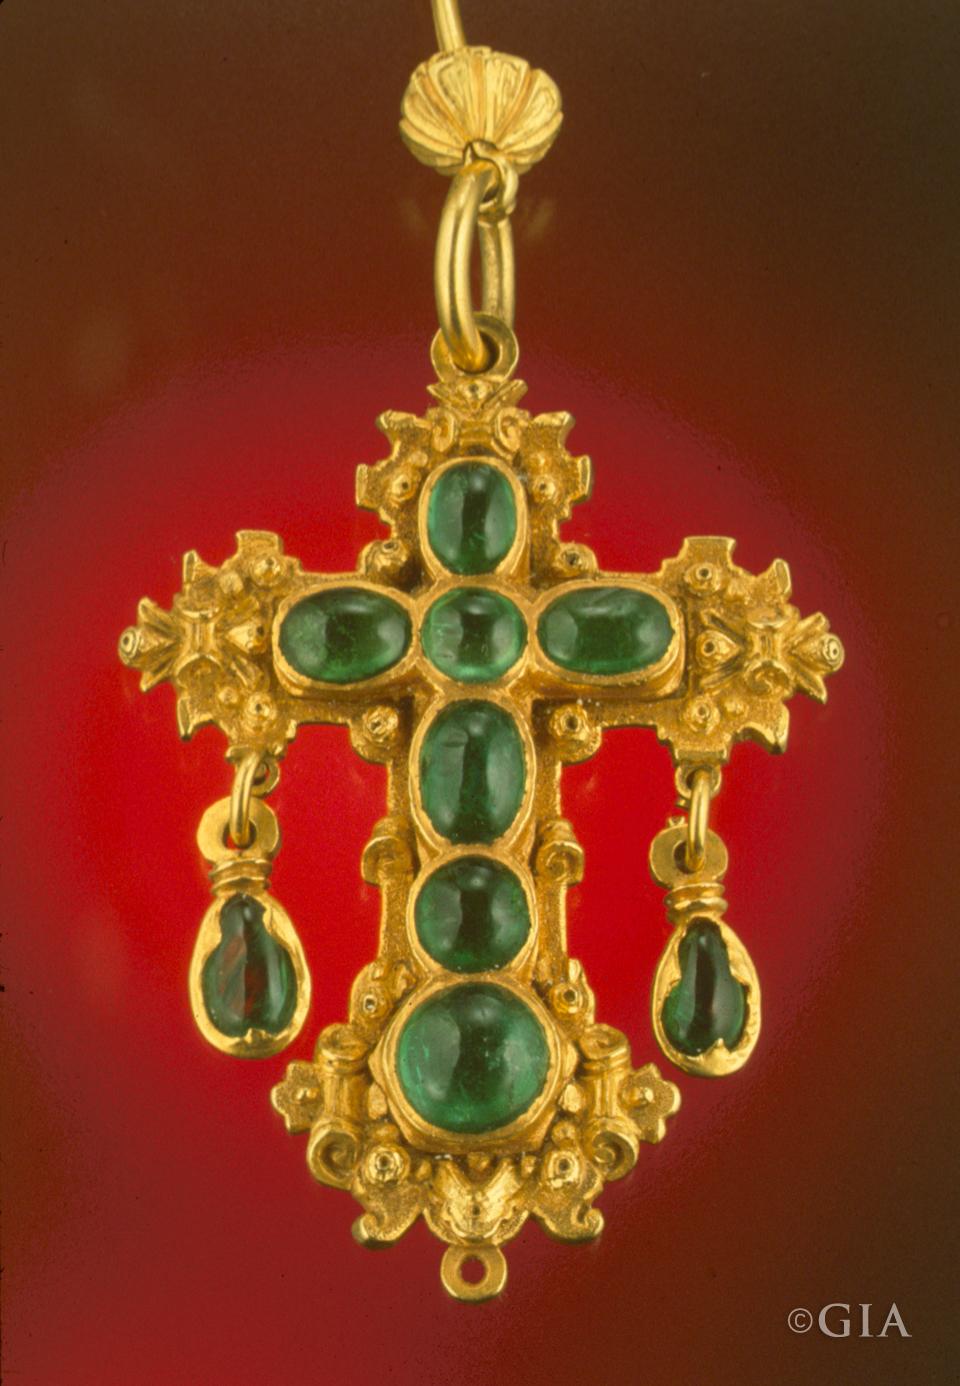 The Wonderful World Of Color Pt 4 Emerald Royal Diadem